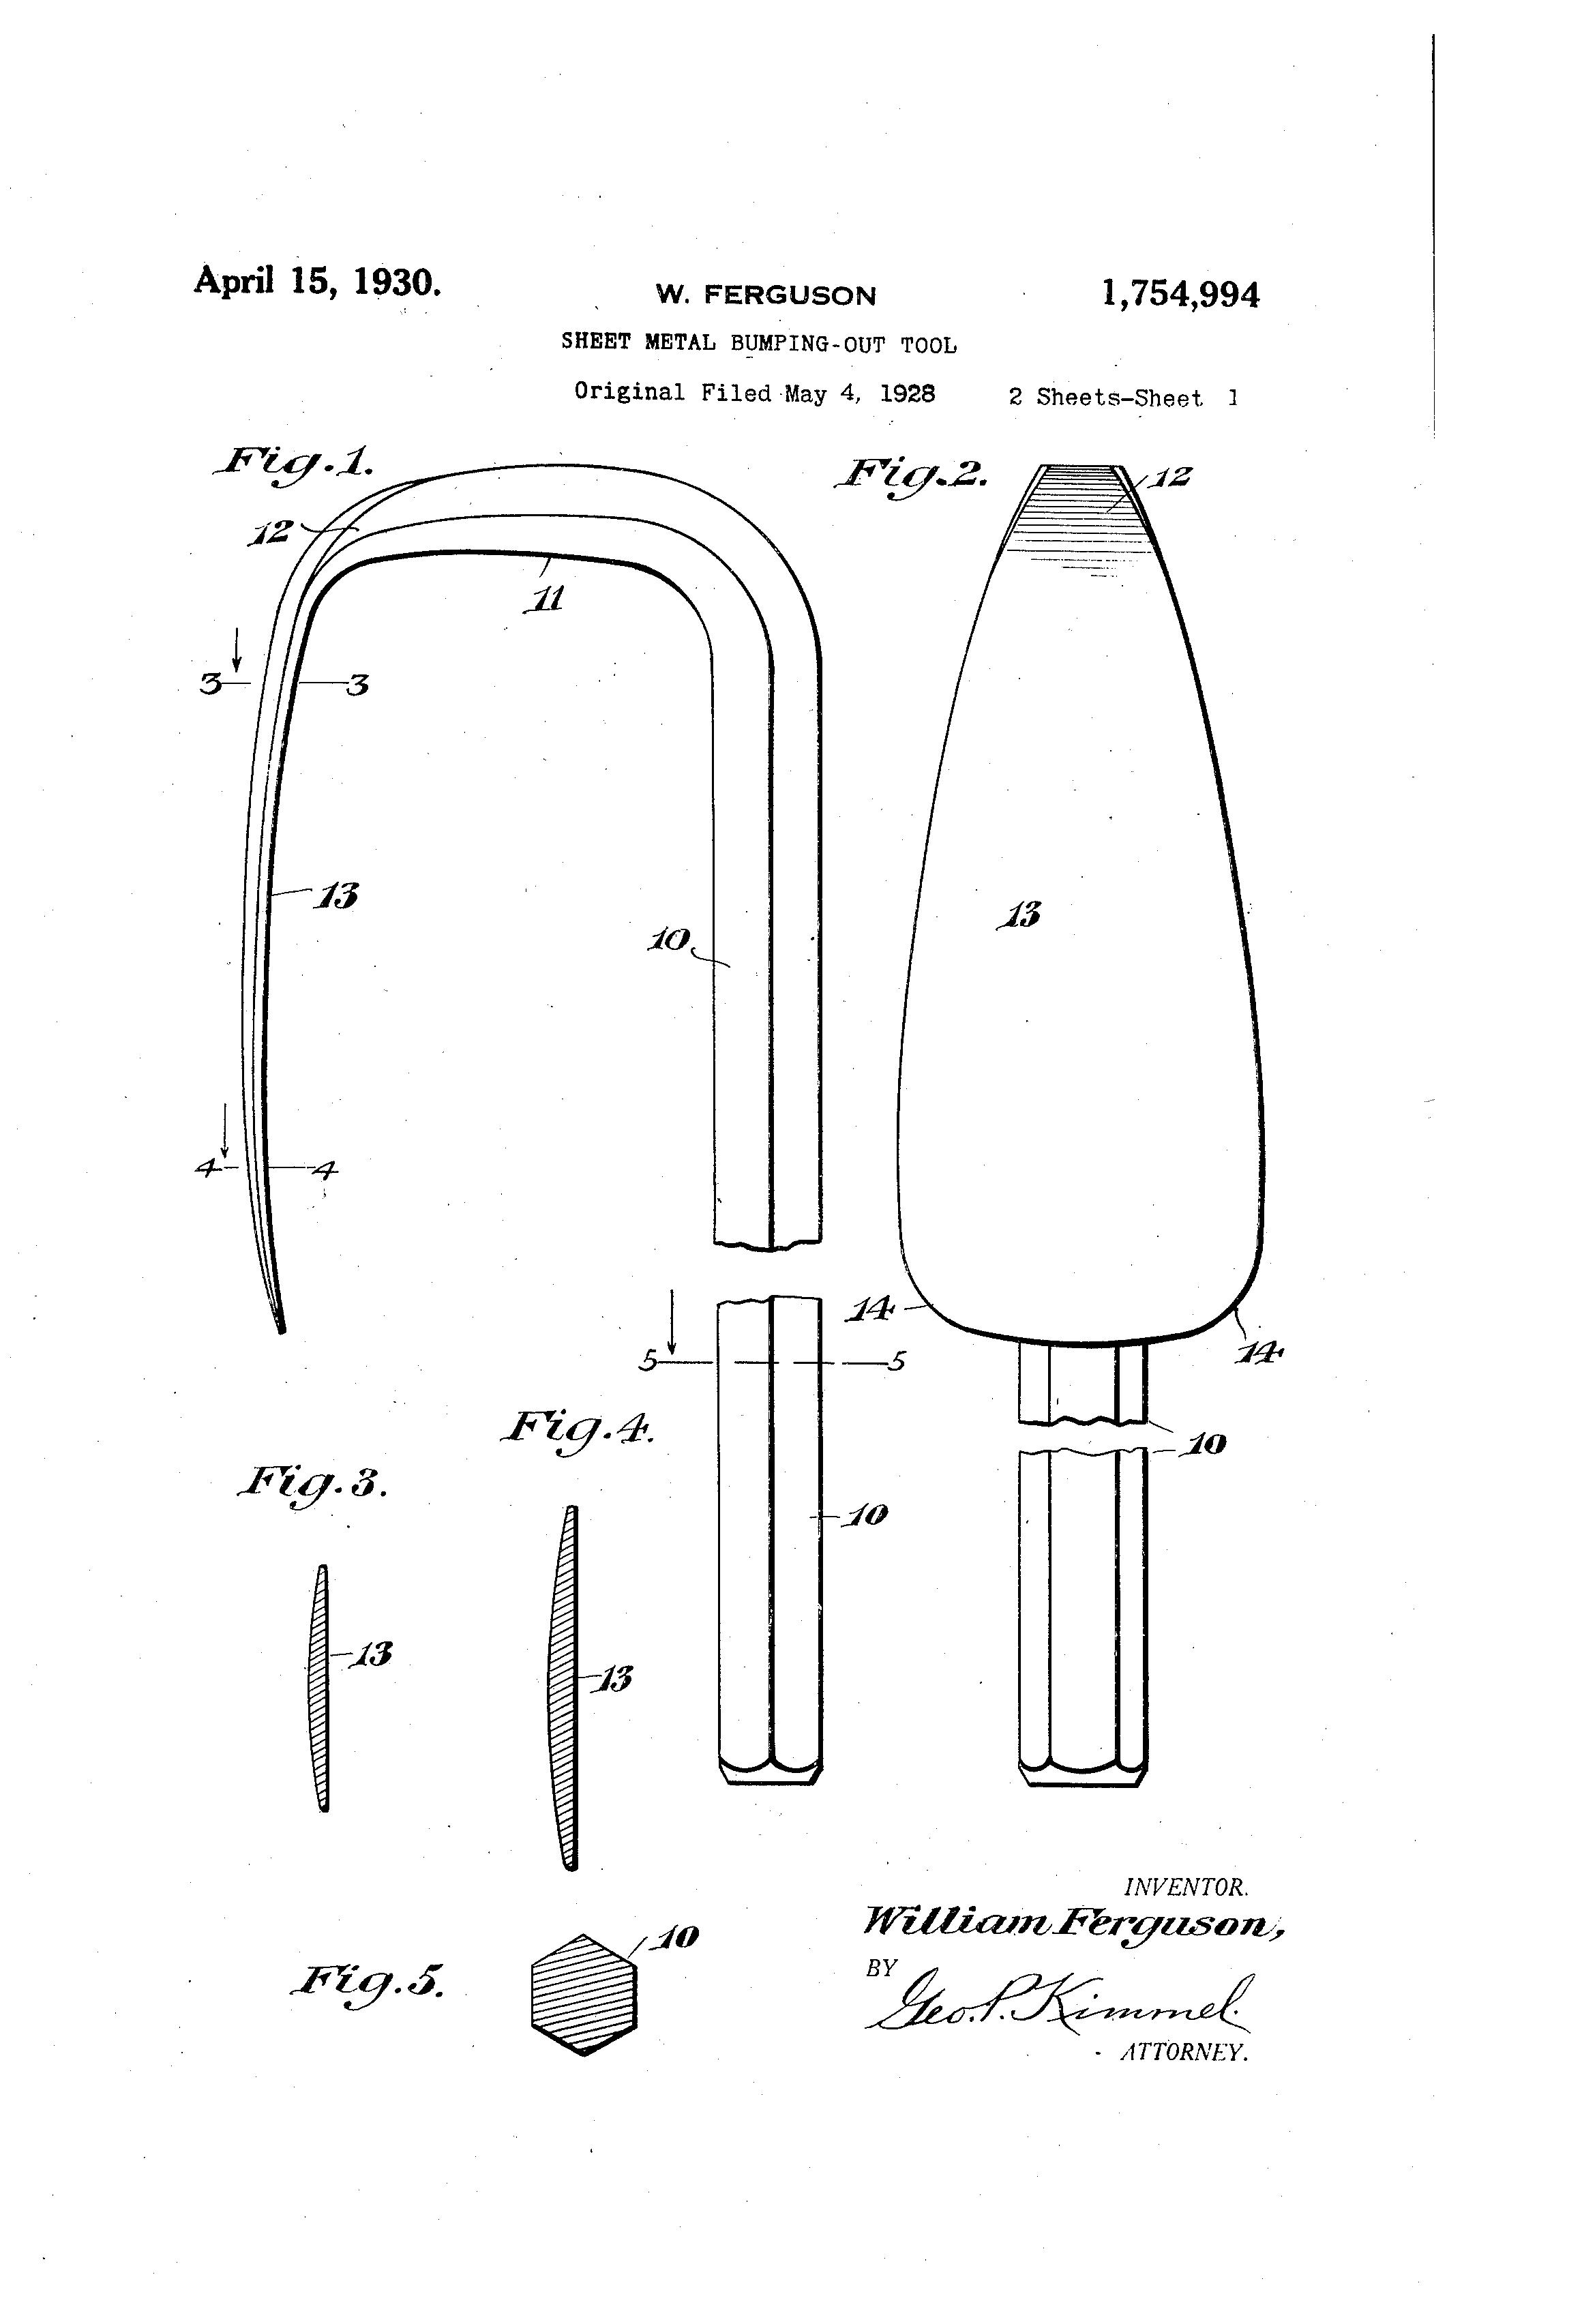 Patent US1754994 - Sheet-metal bumping-out tool - Google Patents